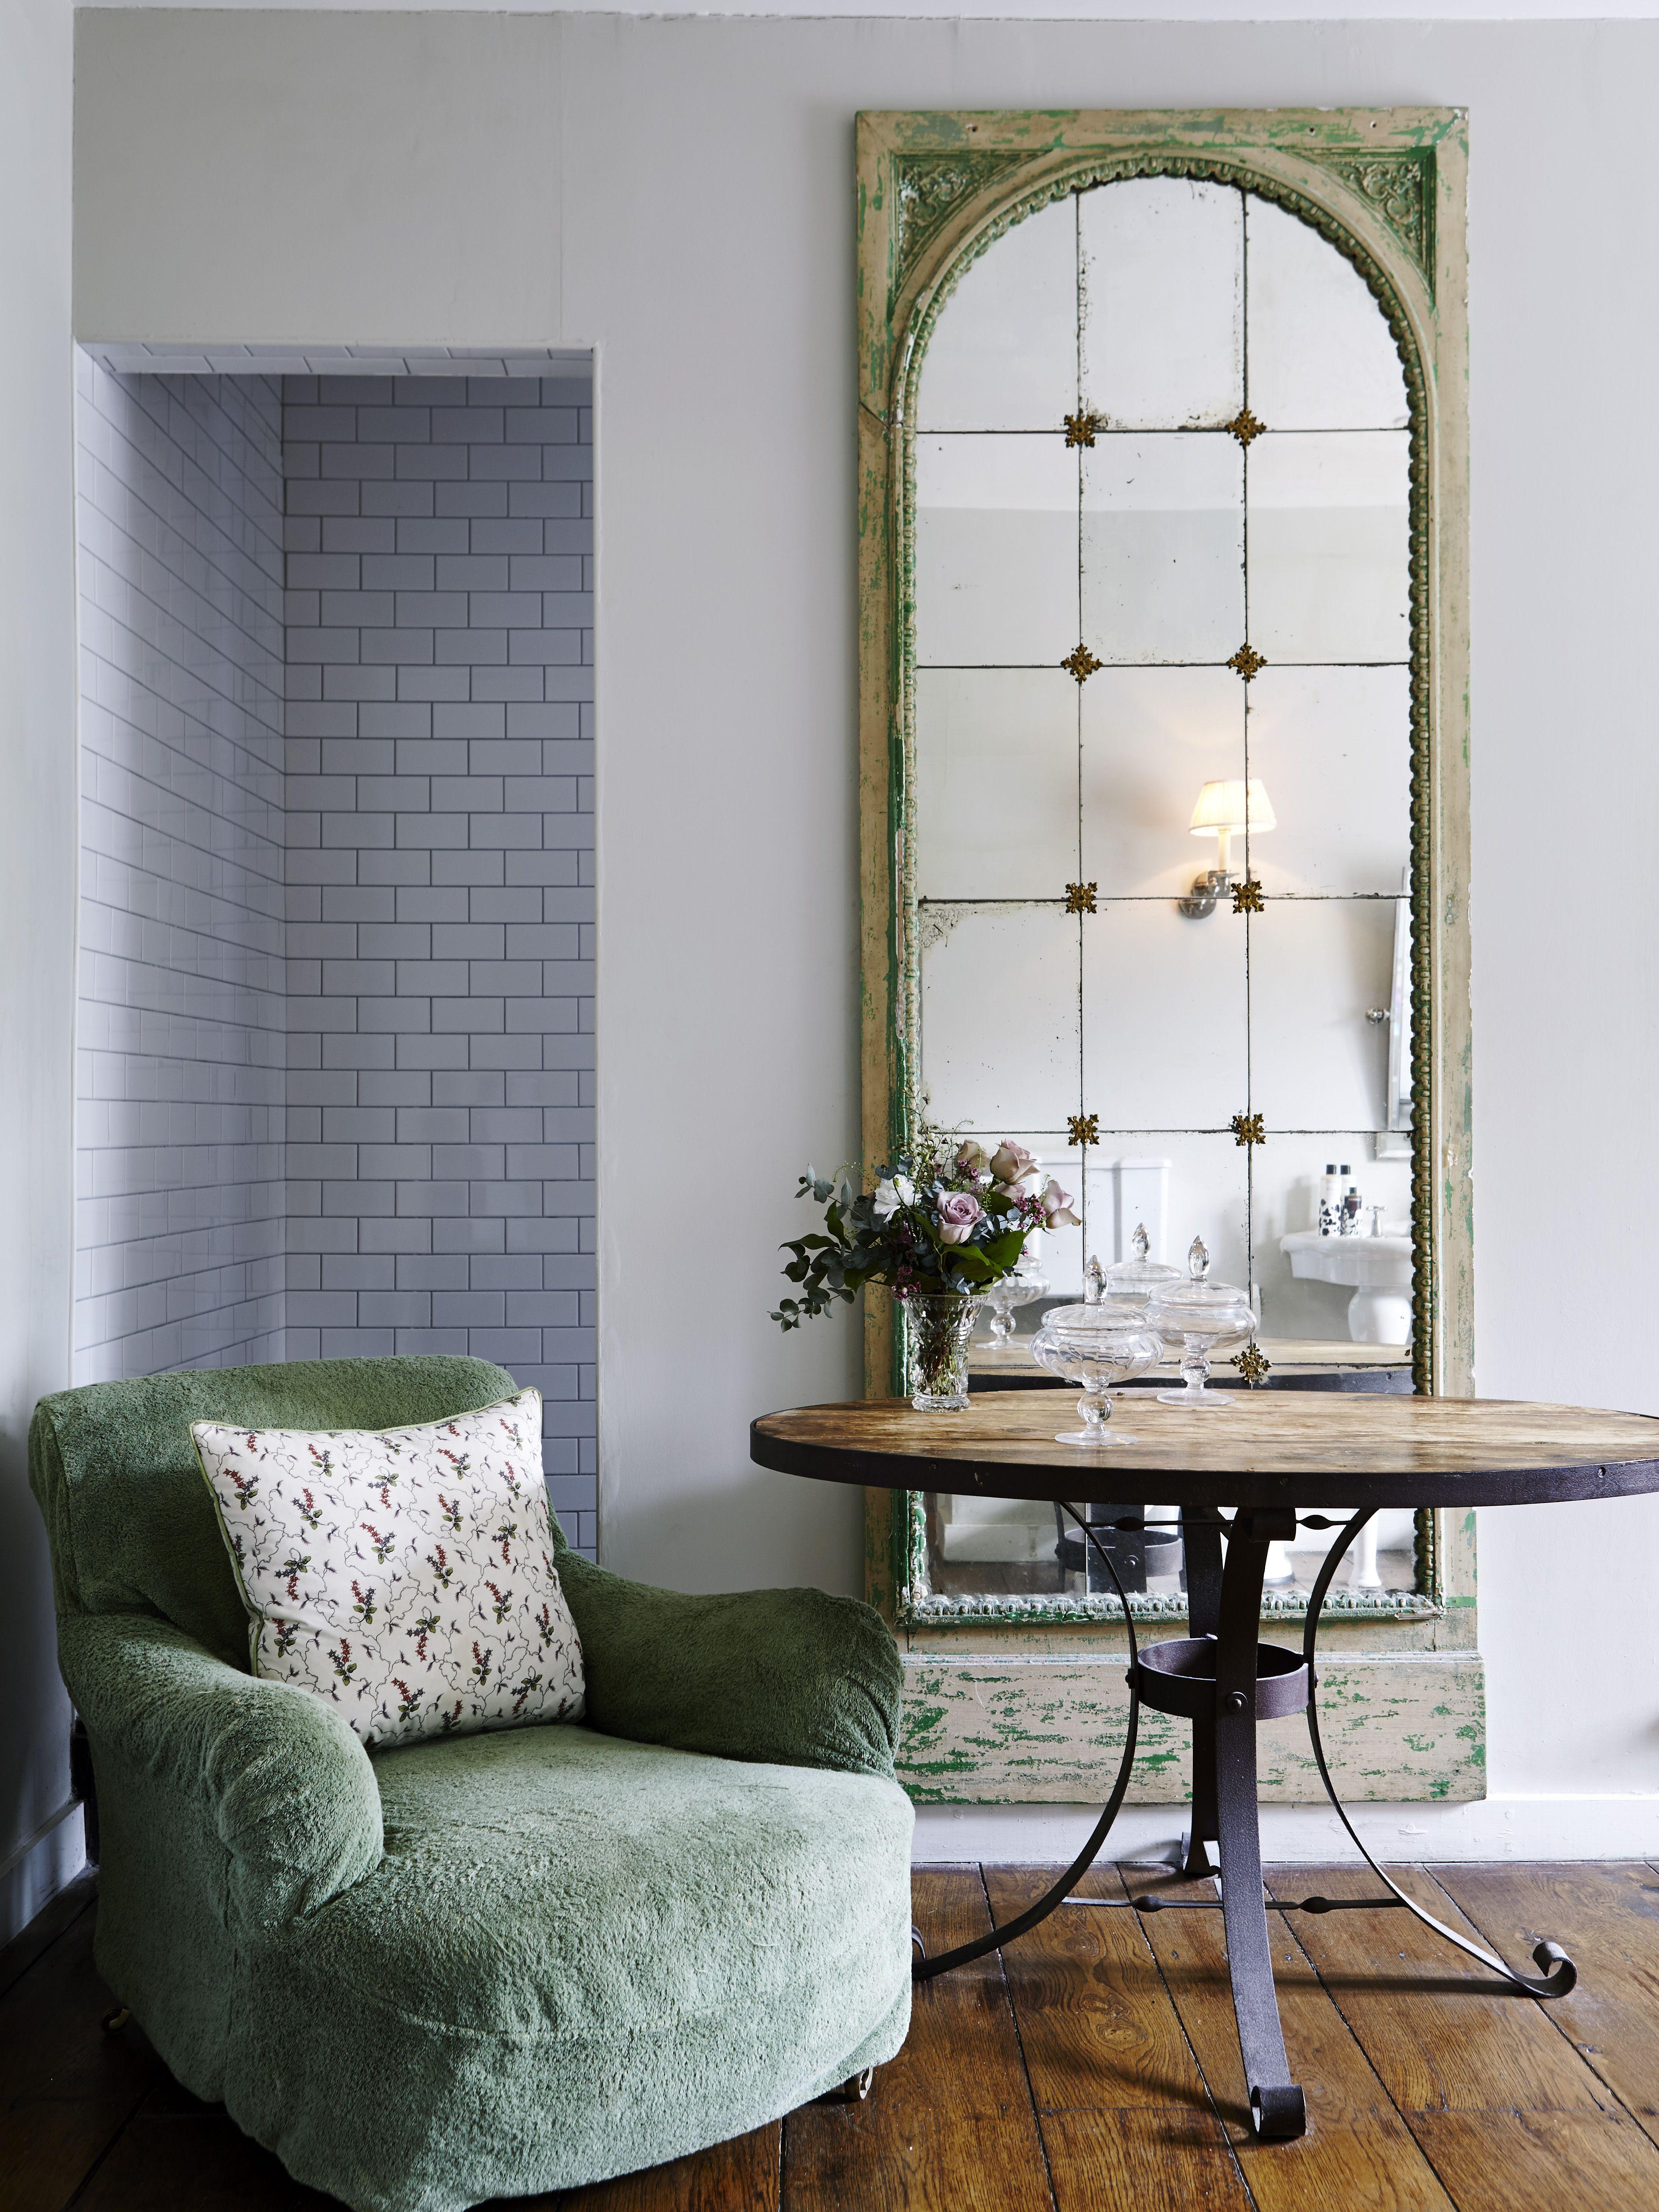 The Coach House At Babington House | Soho House